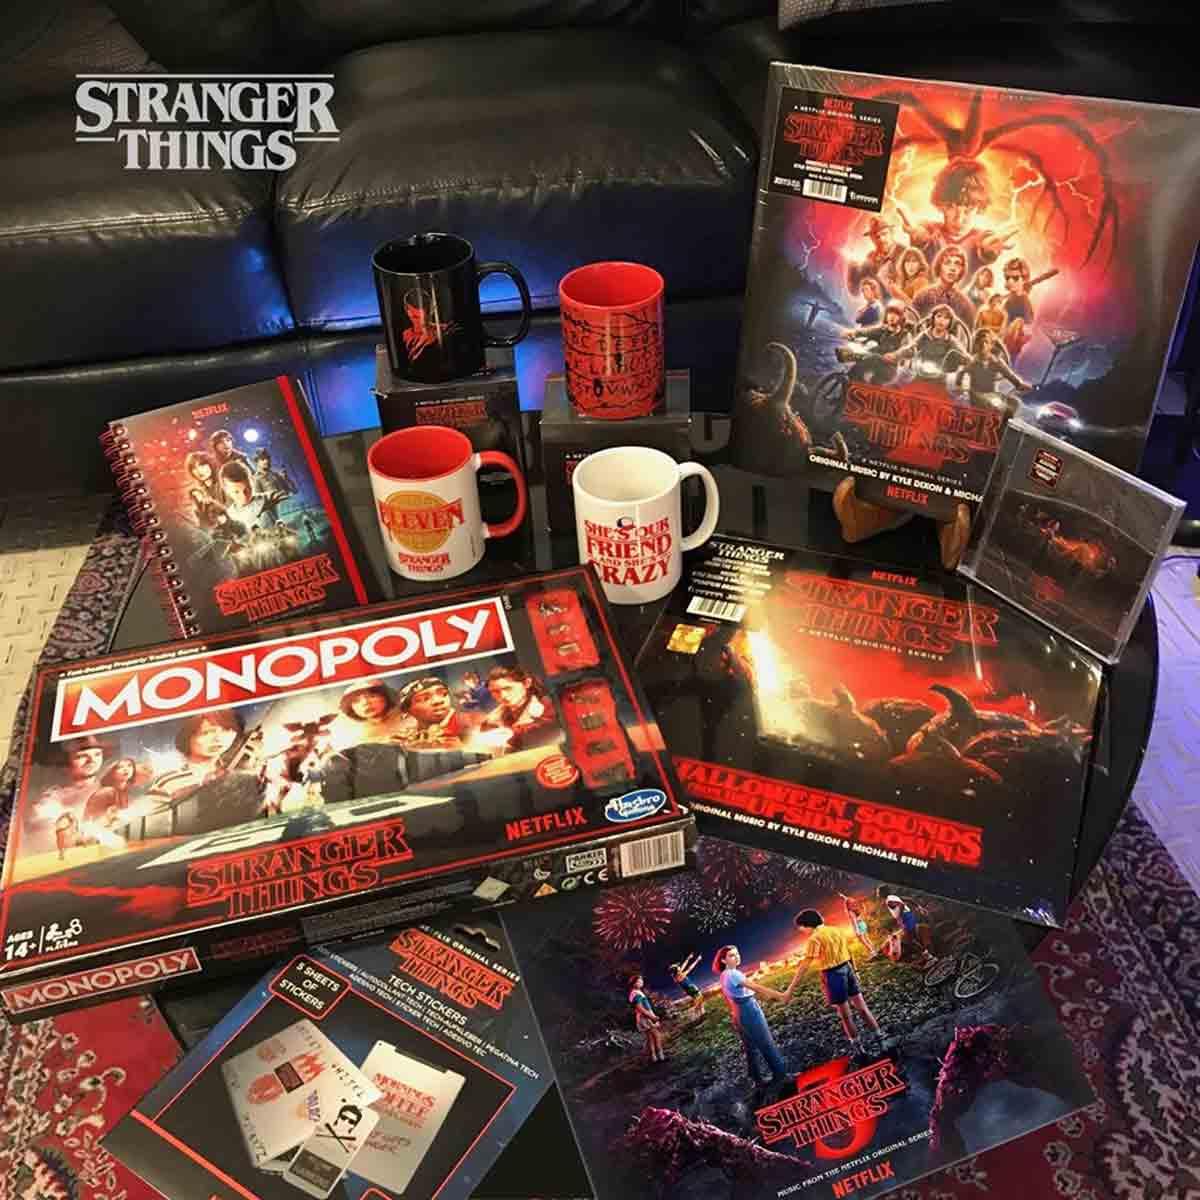 Stranger Things Music & Official Merchandise